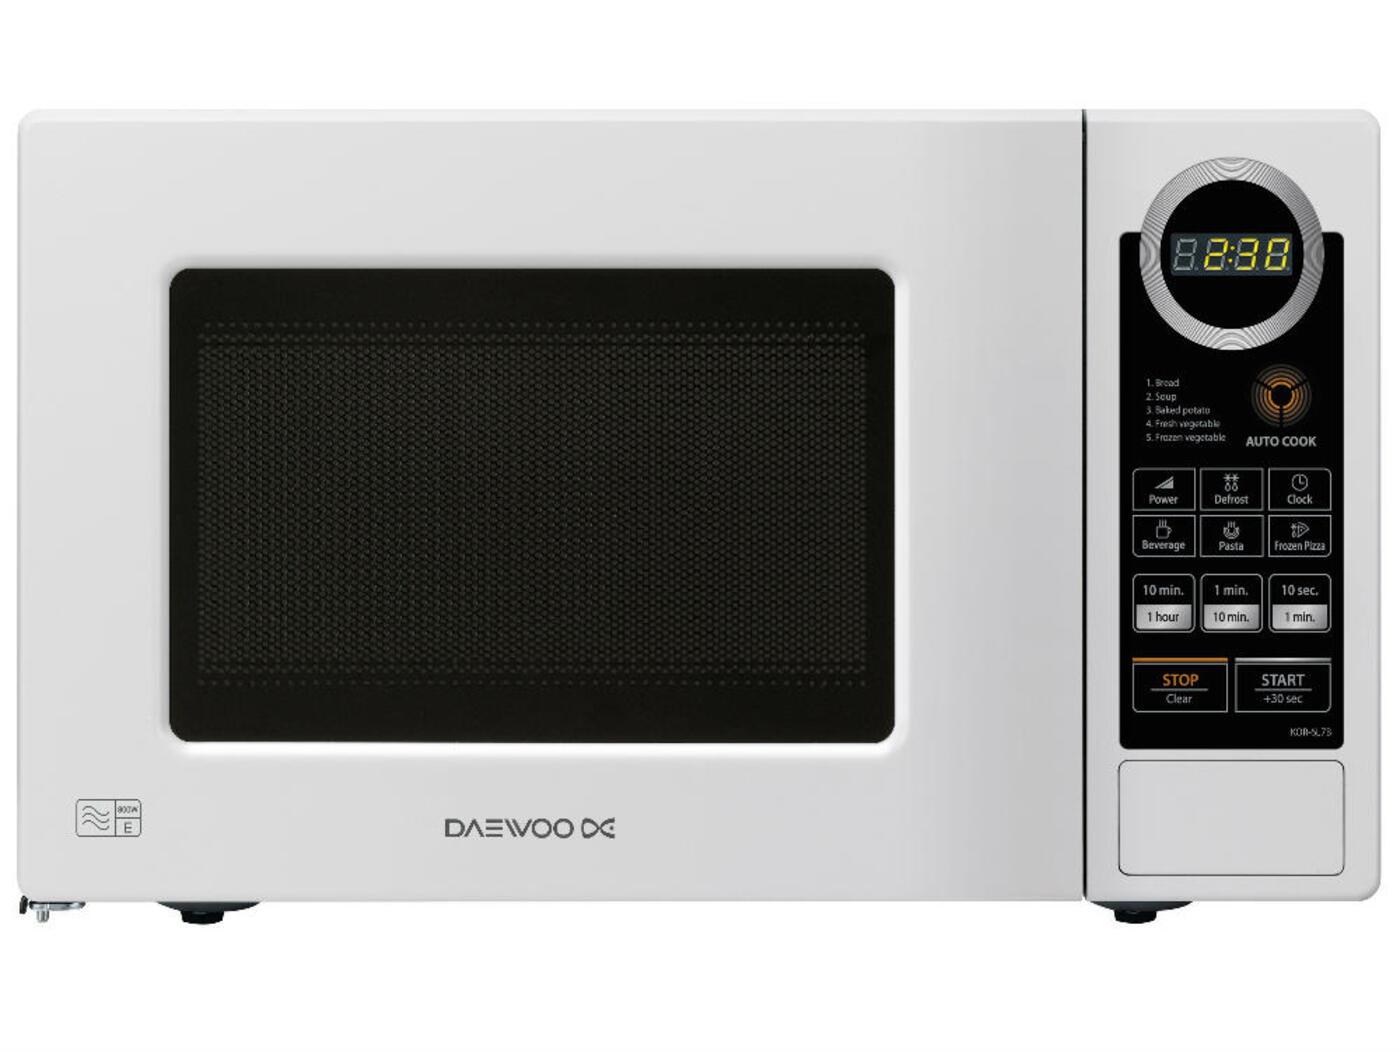 Daewoo 20l Touch Control Microwave Oven 700 Watt